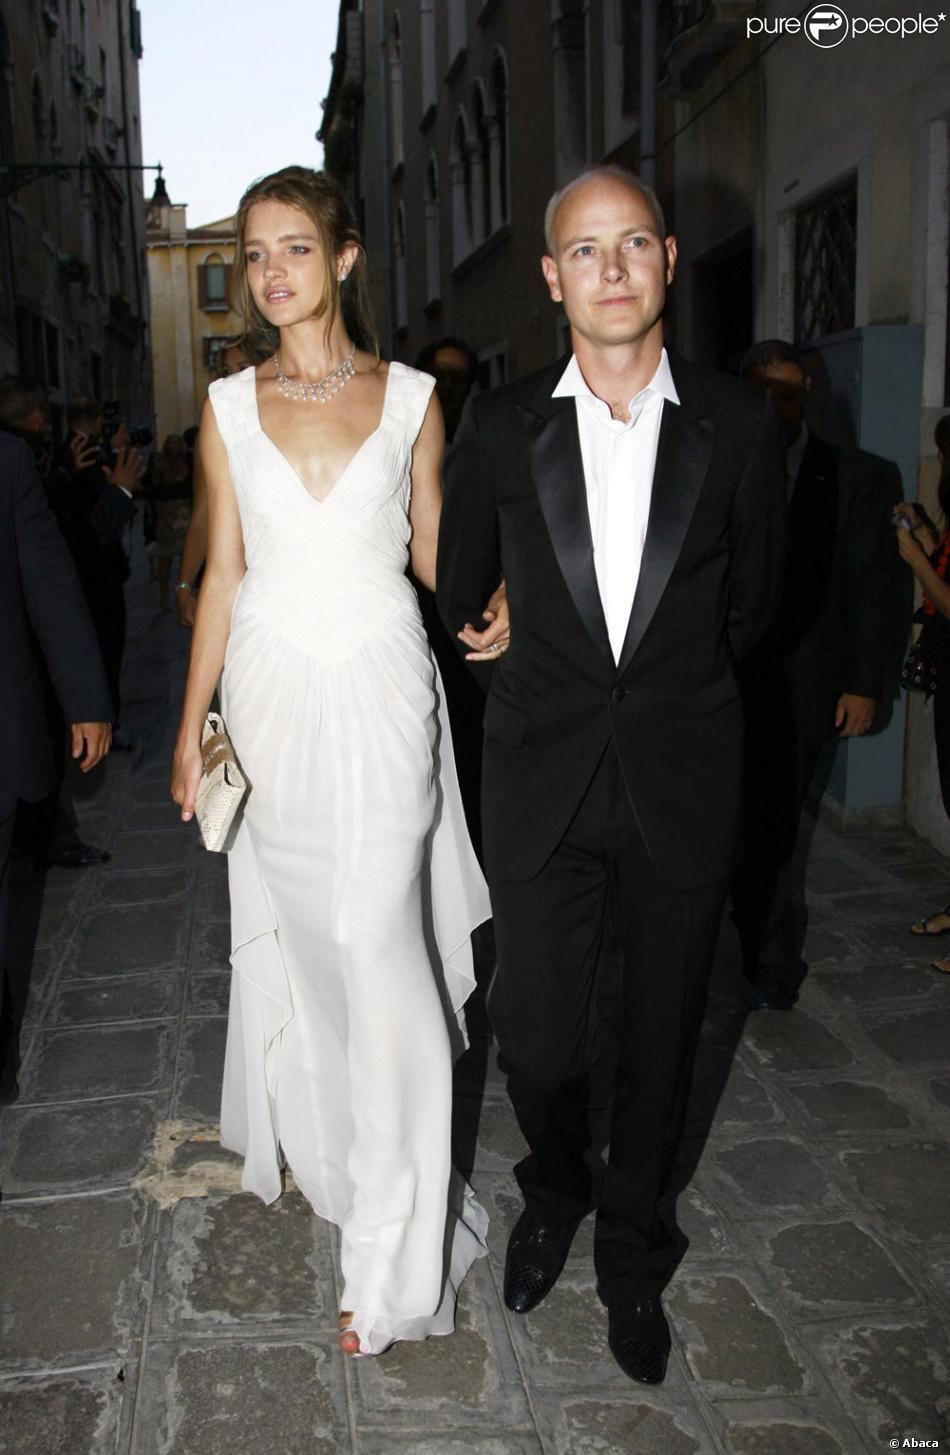 Водянова и портман свадьба фото